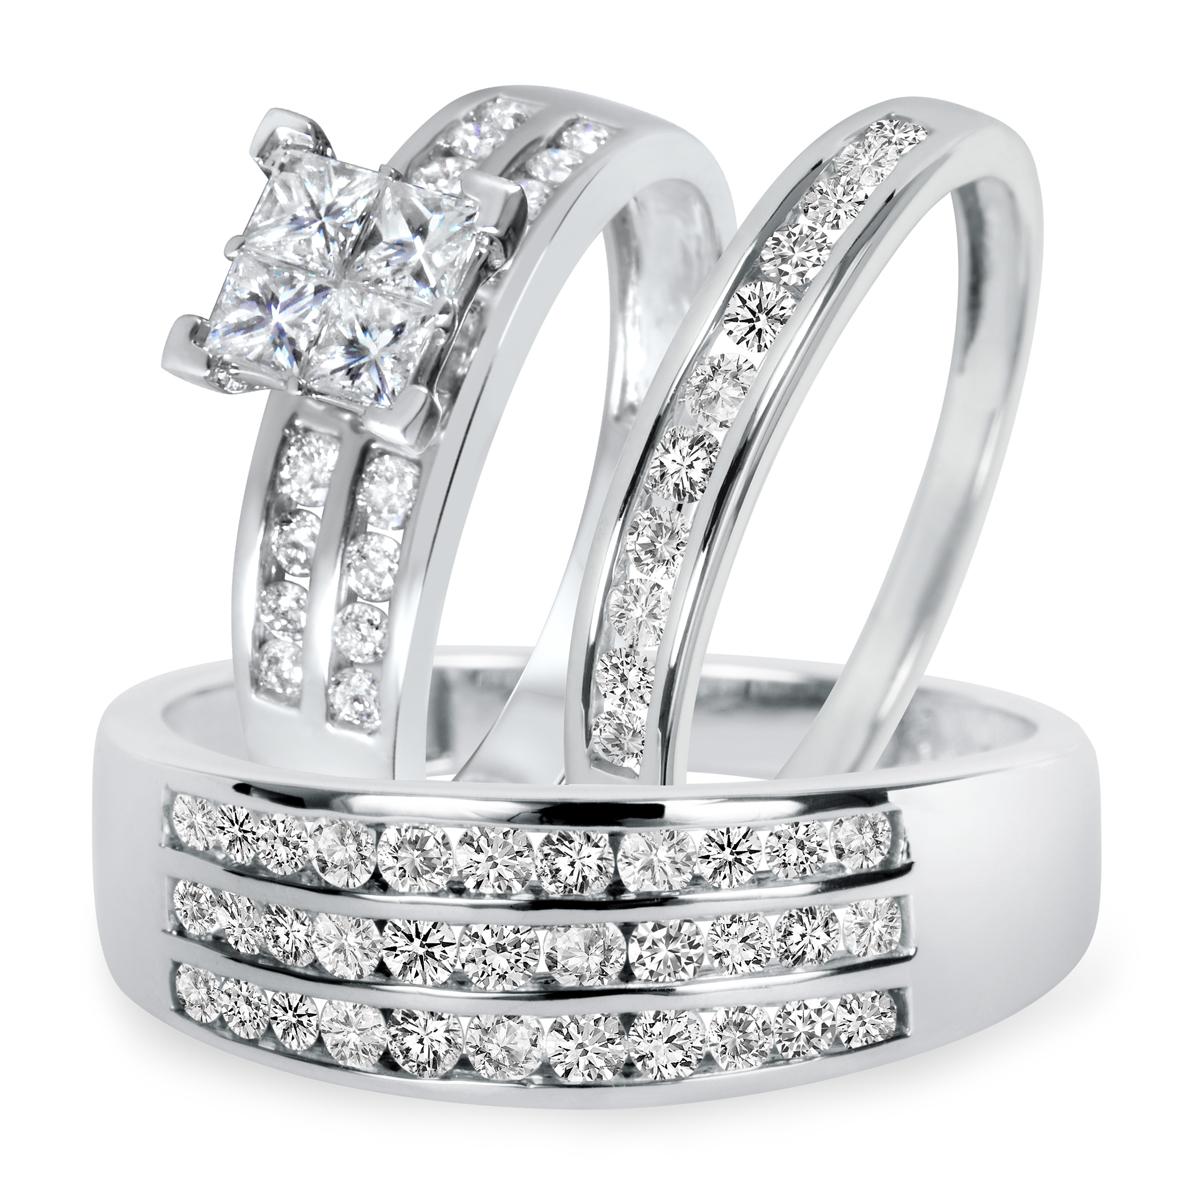 1 3/4 CT. T.W. Diamond Ladies Engagement Ring, Wedding Band, Men's Wedding Band